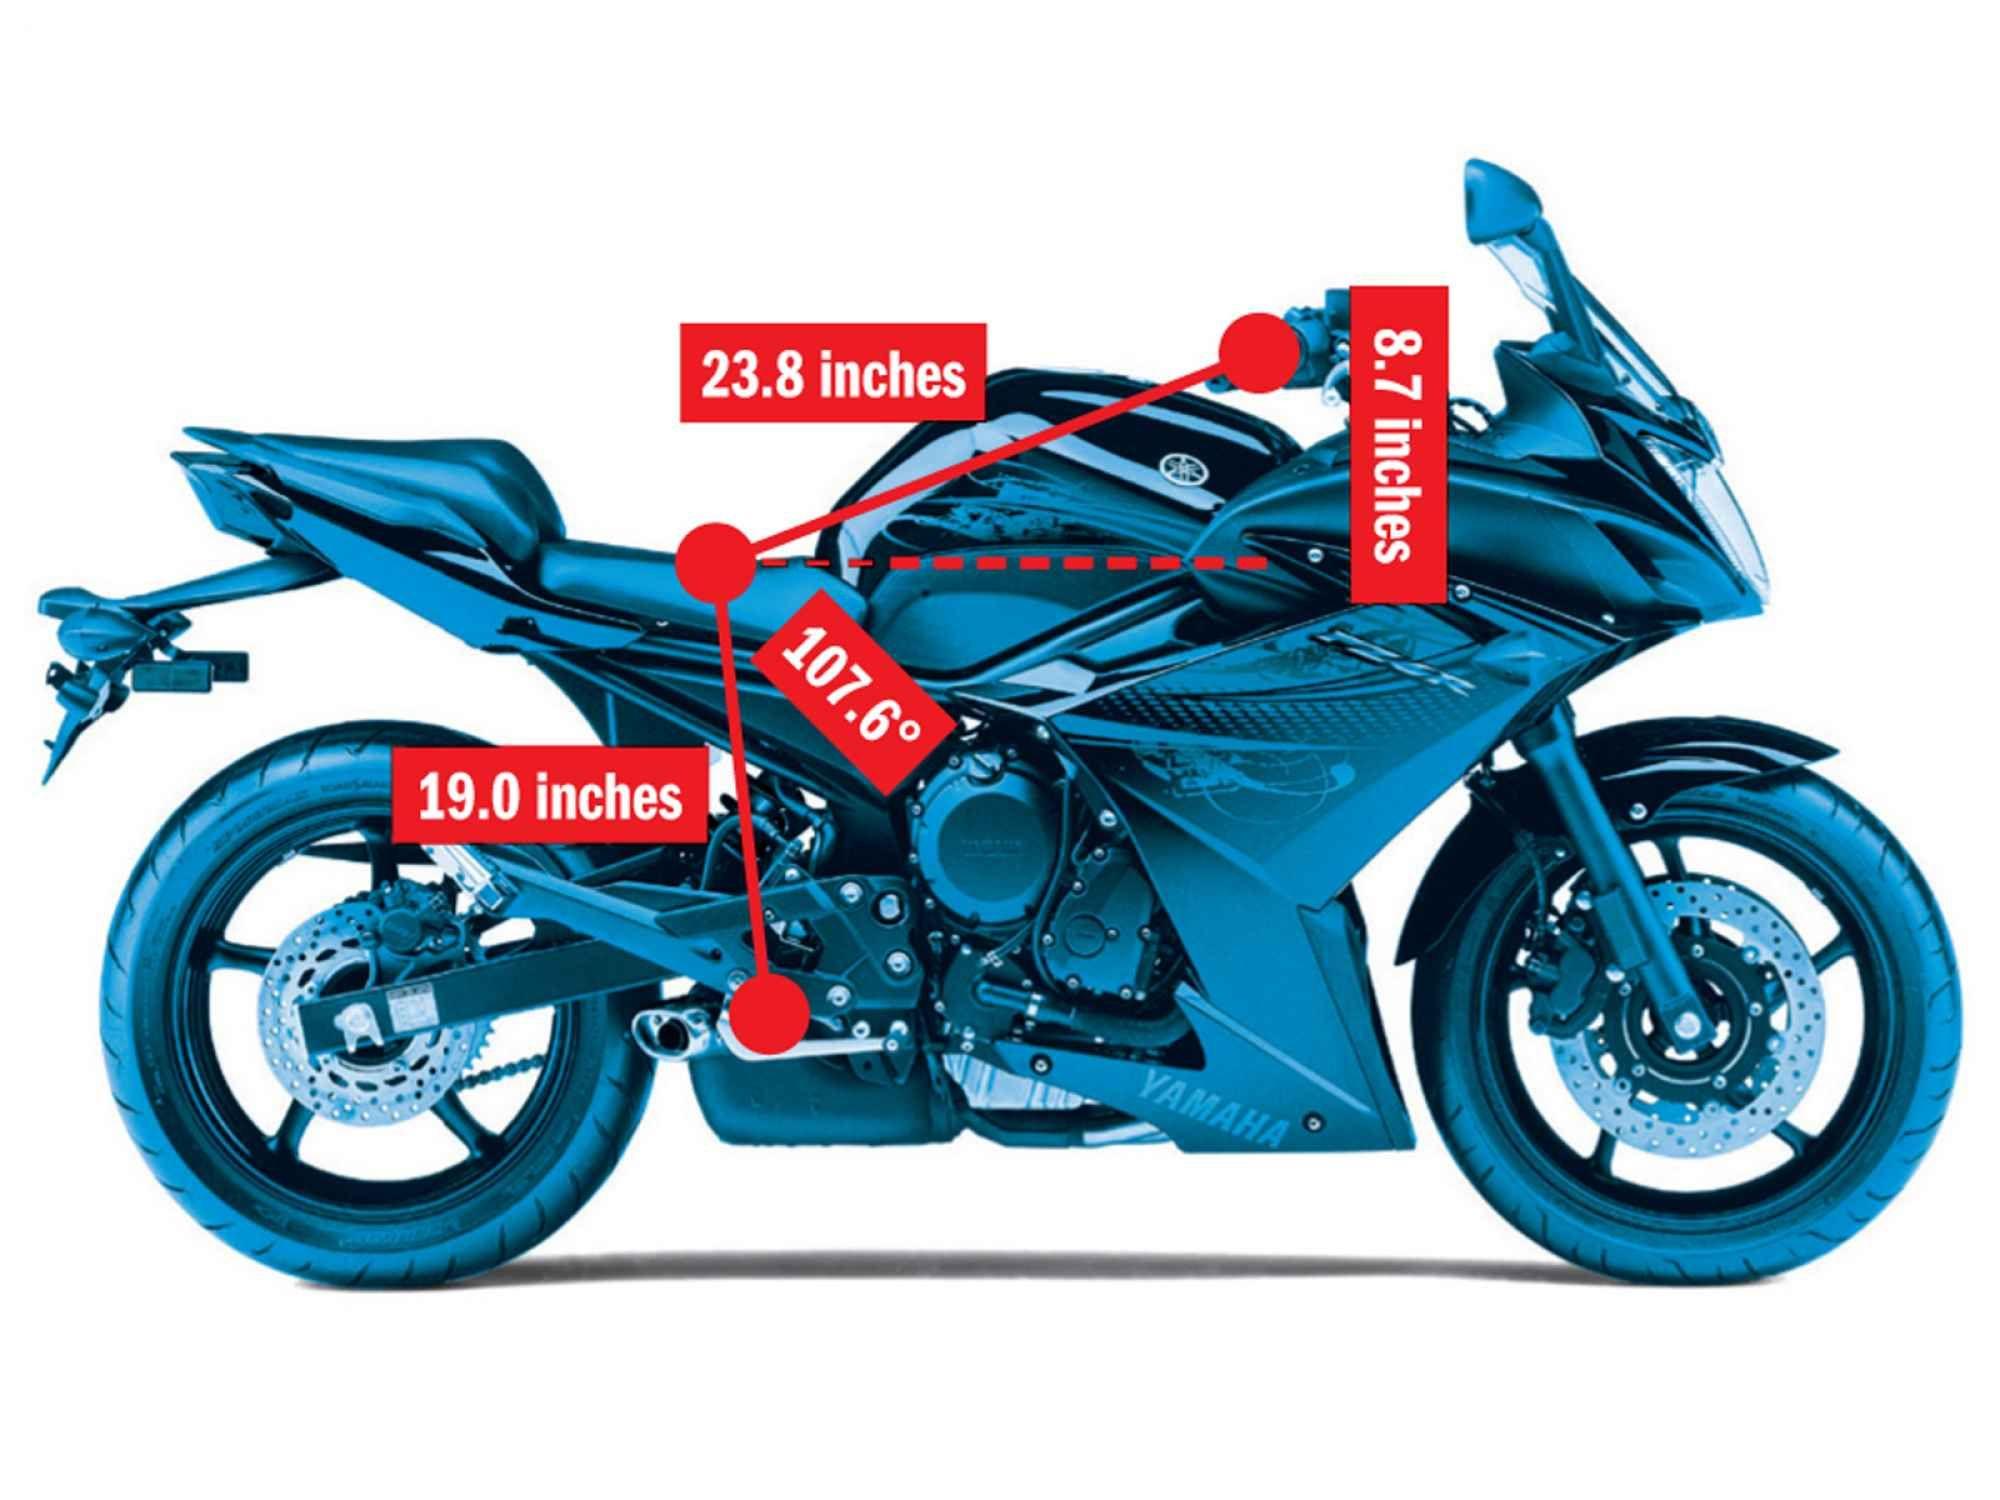 motorcycle ergonomics - Google Search